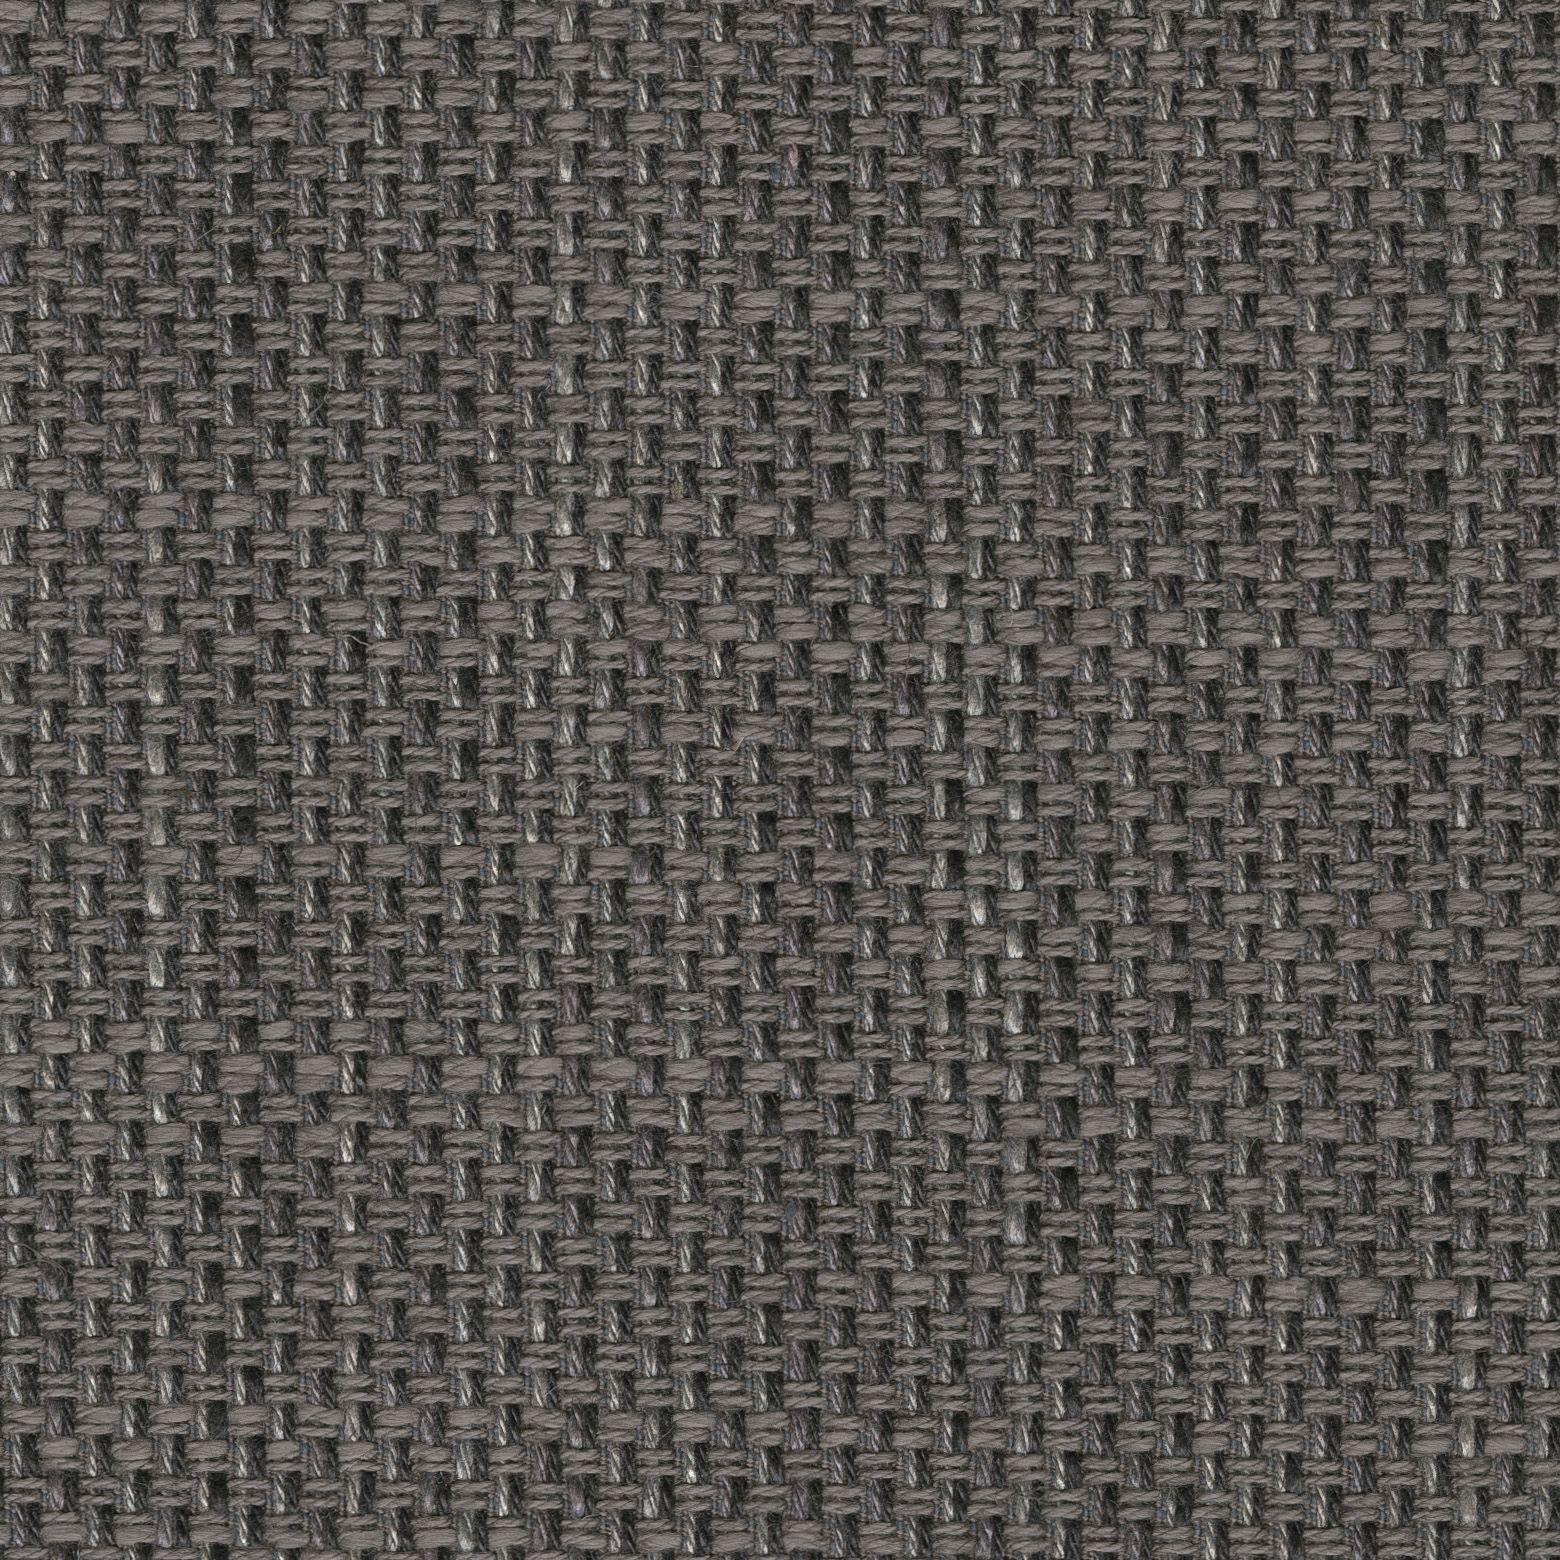 grey sofa fabric texture round chair canada bill sofield 34 507 woven black baker